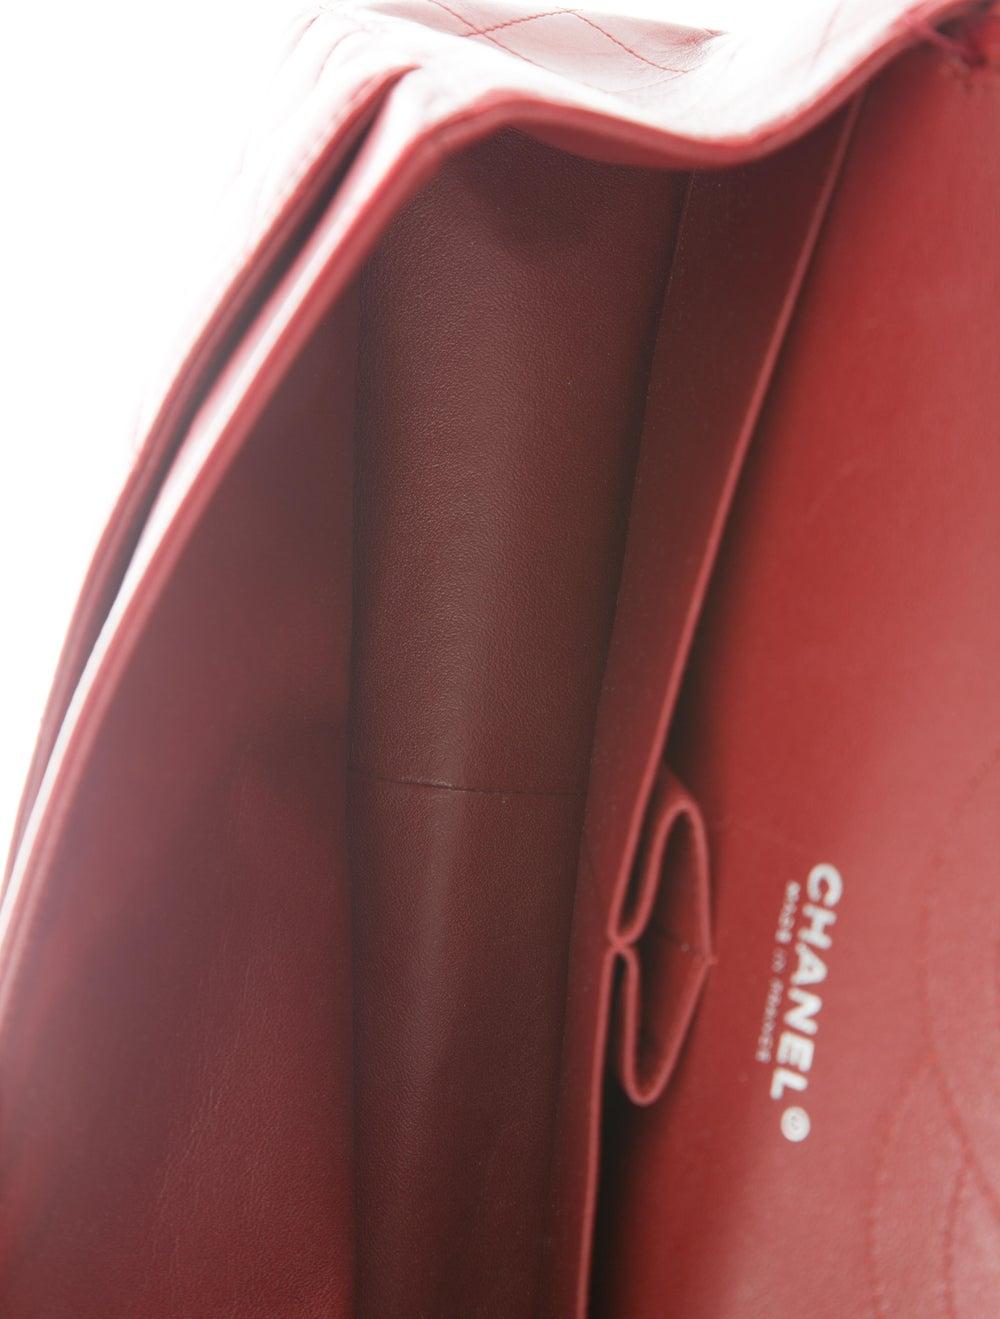 Chanel Jumbo Classic Double Flap Bag silver - image 5